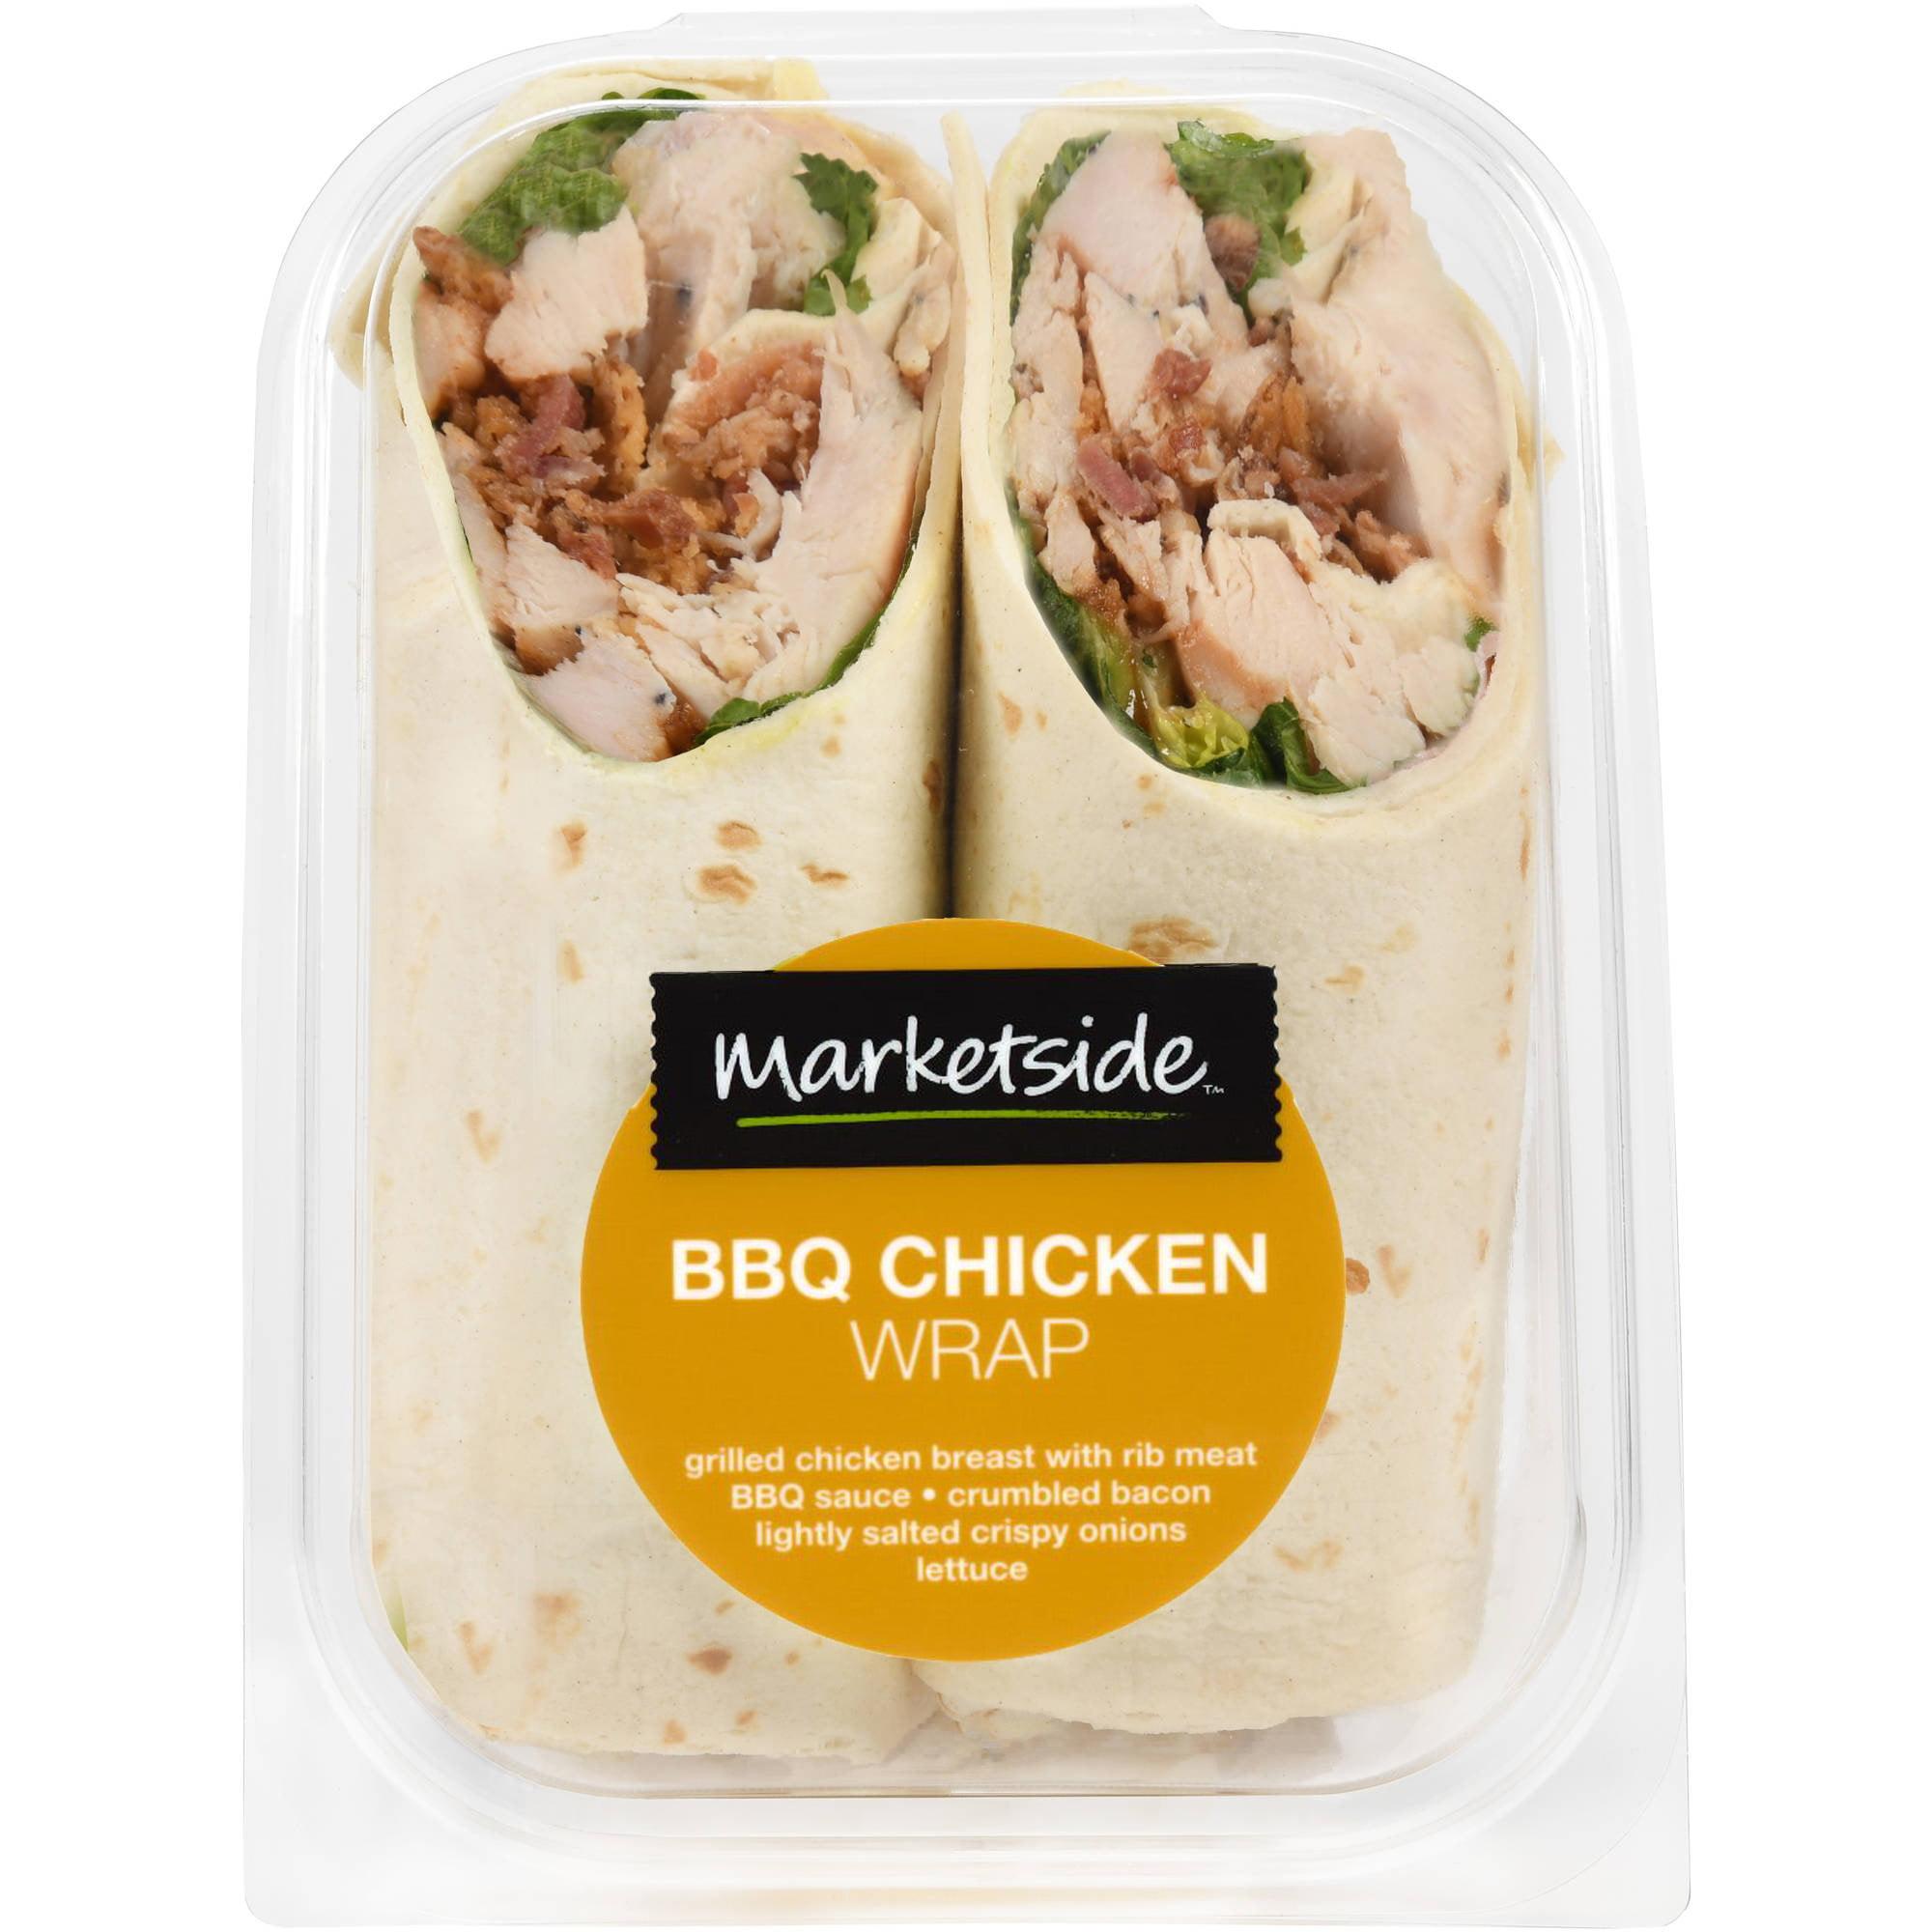 Marketside BBQ Chicken Wrap - Walmart.com